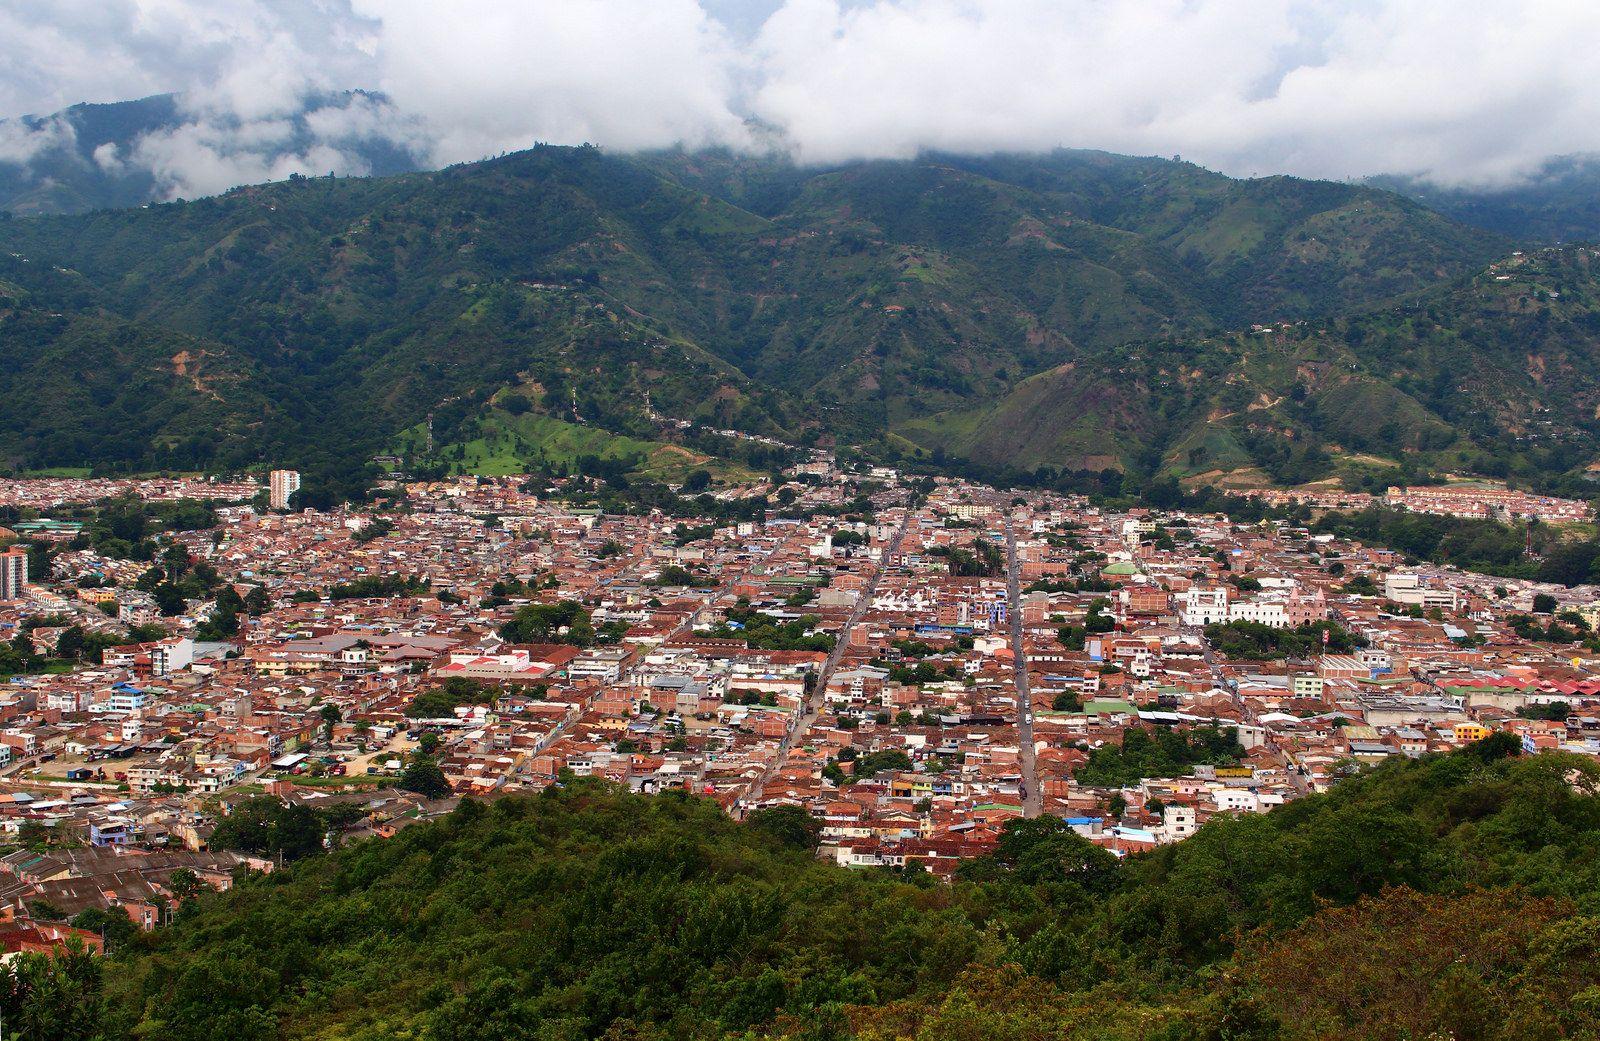 Piedecuesta Santander Colombia Natural Landmarks Dolores Park Aerial